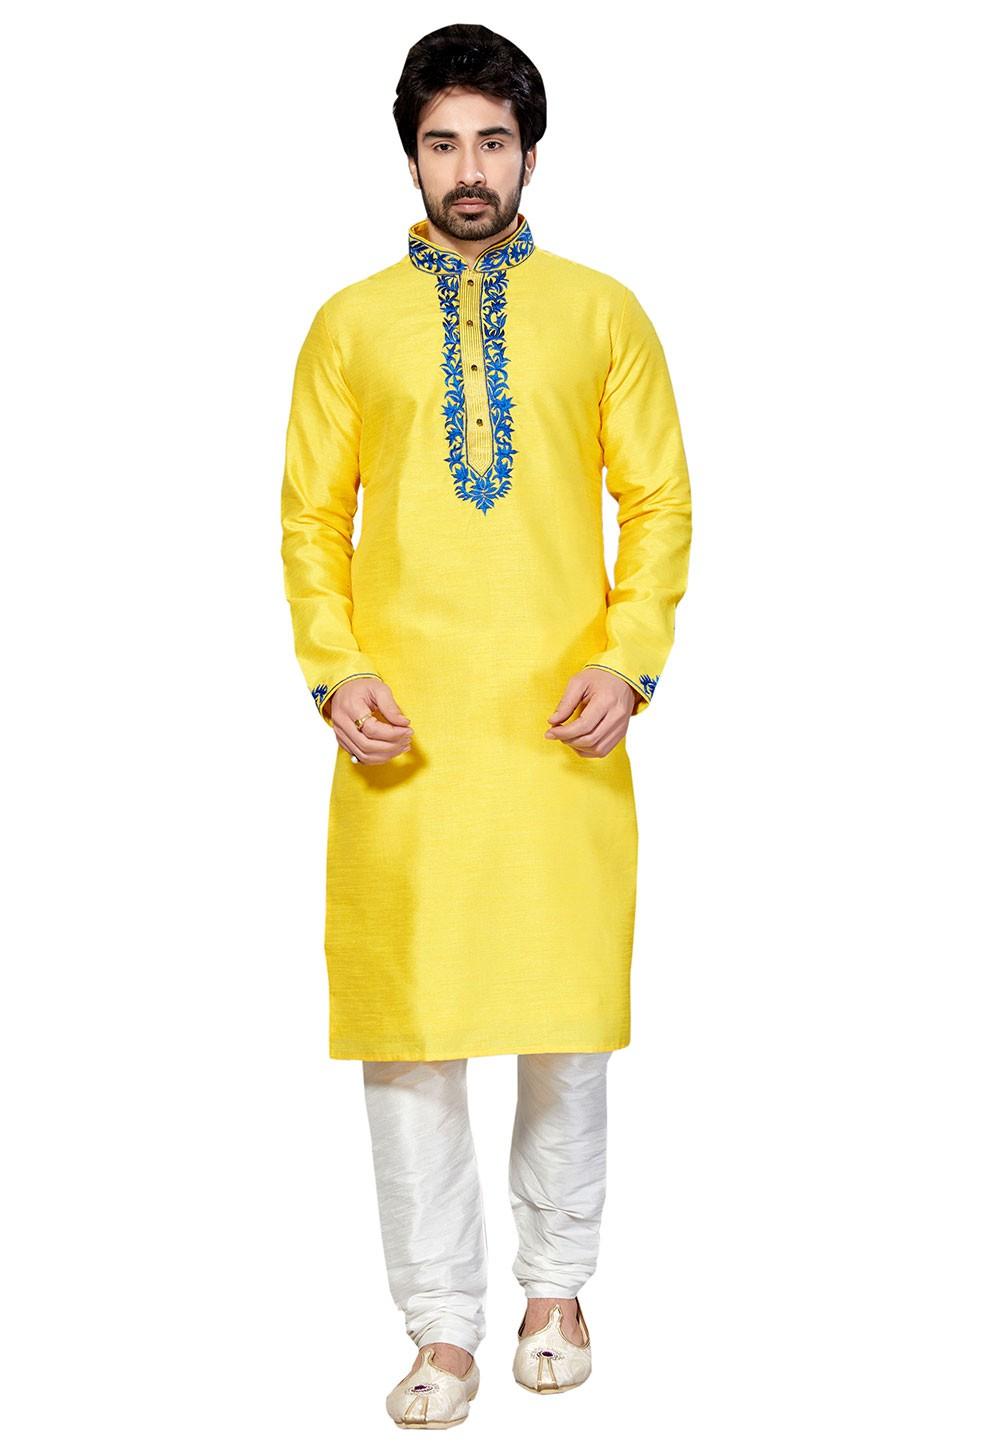 Attractive Yellow Color Dupion Silk Readymade Kurta Pajama With Thread Work.